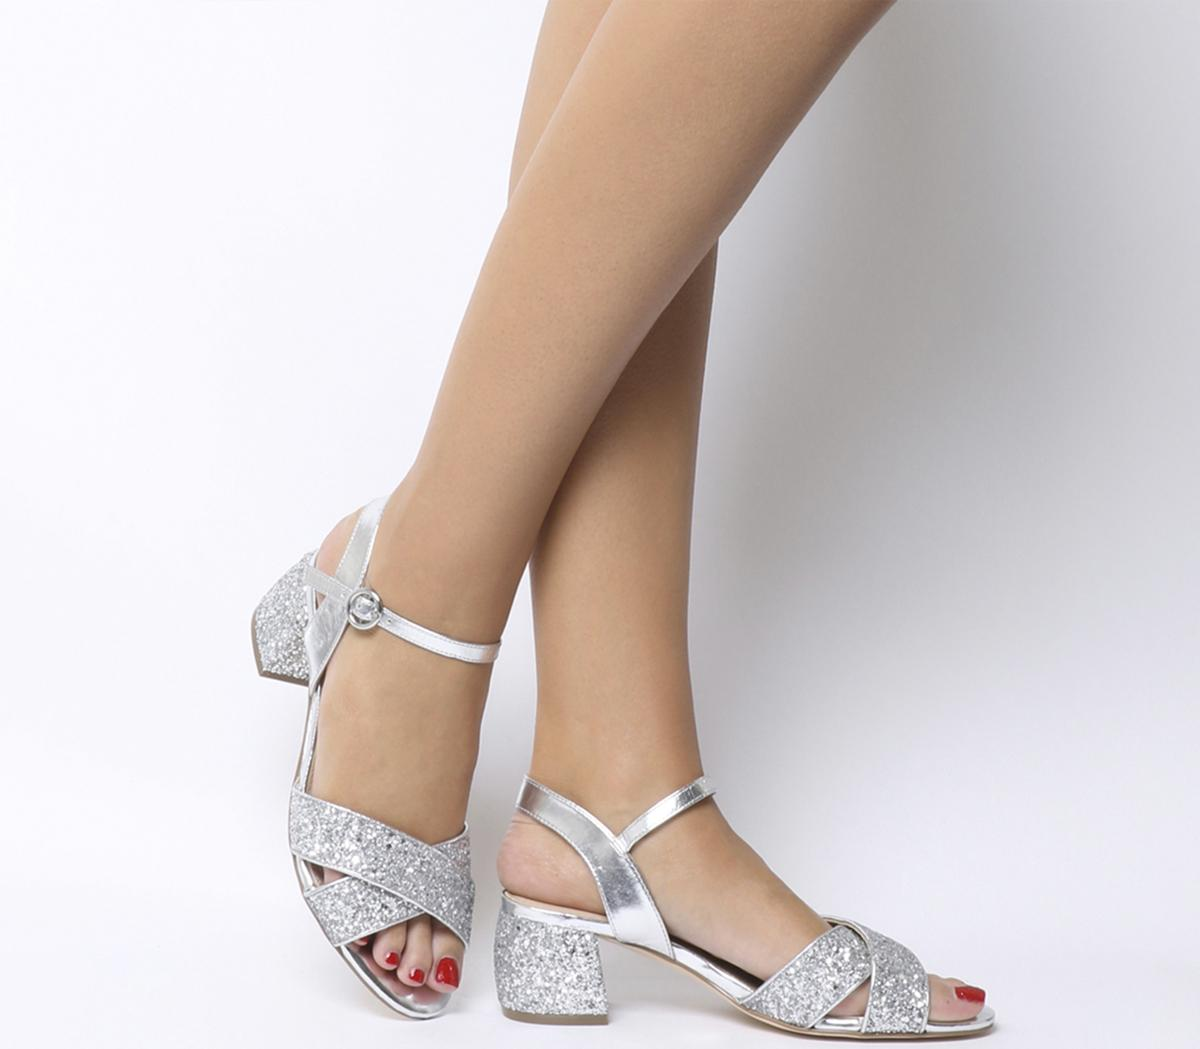 30b906657dba Merlot Block Heel Sandal. Double tap to zoom into the image